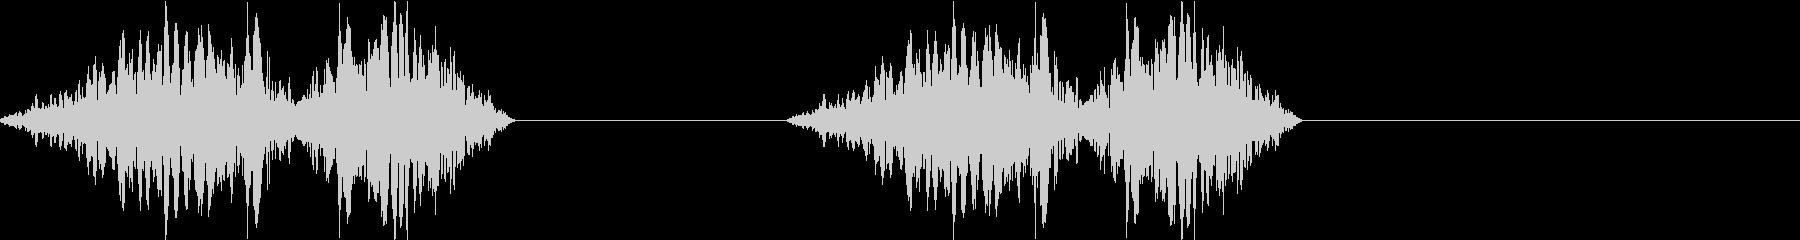 DJプレイ スクラッチ・ノイズ 200の未再生の波形